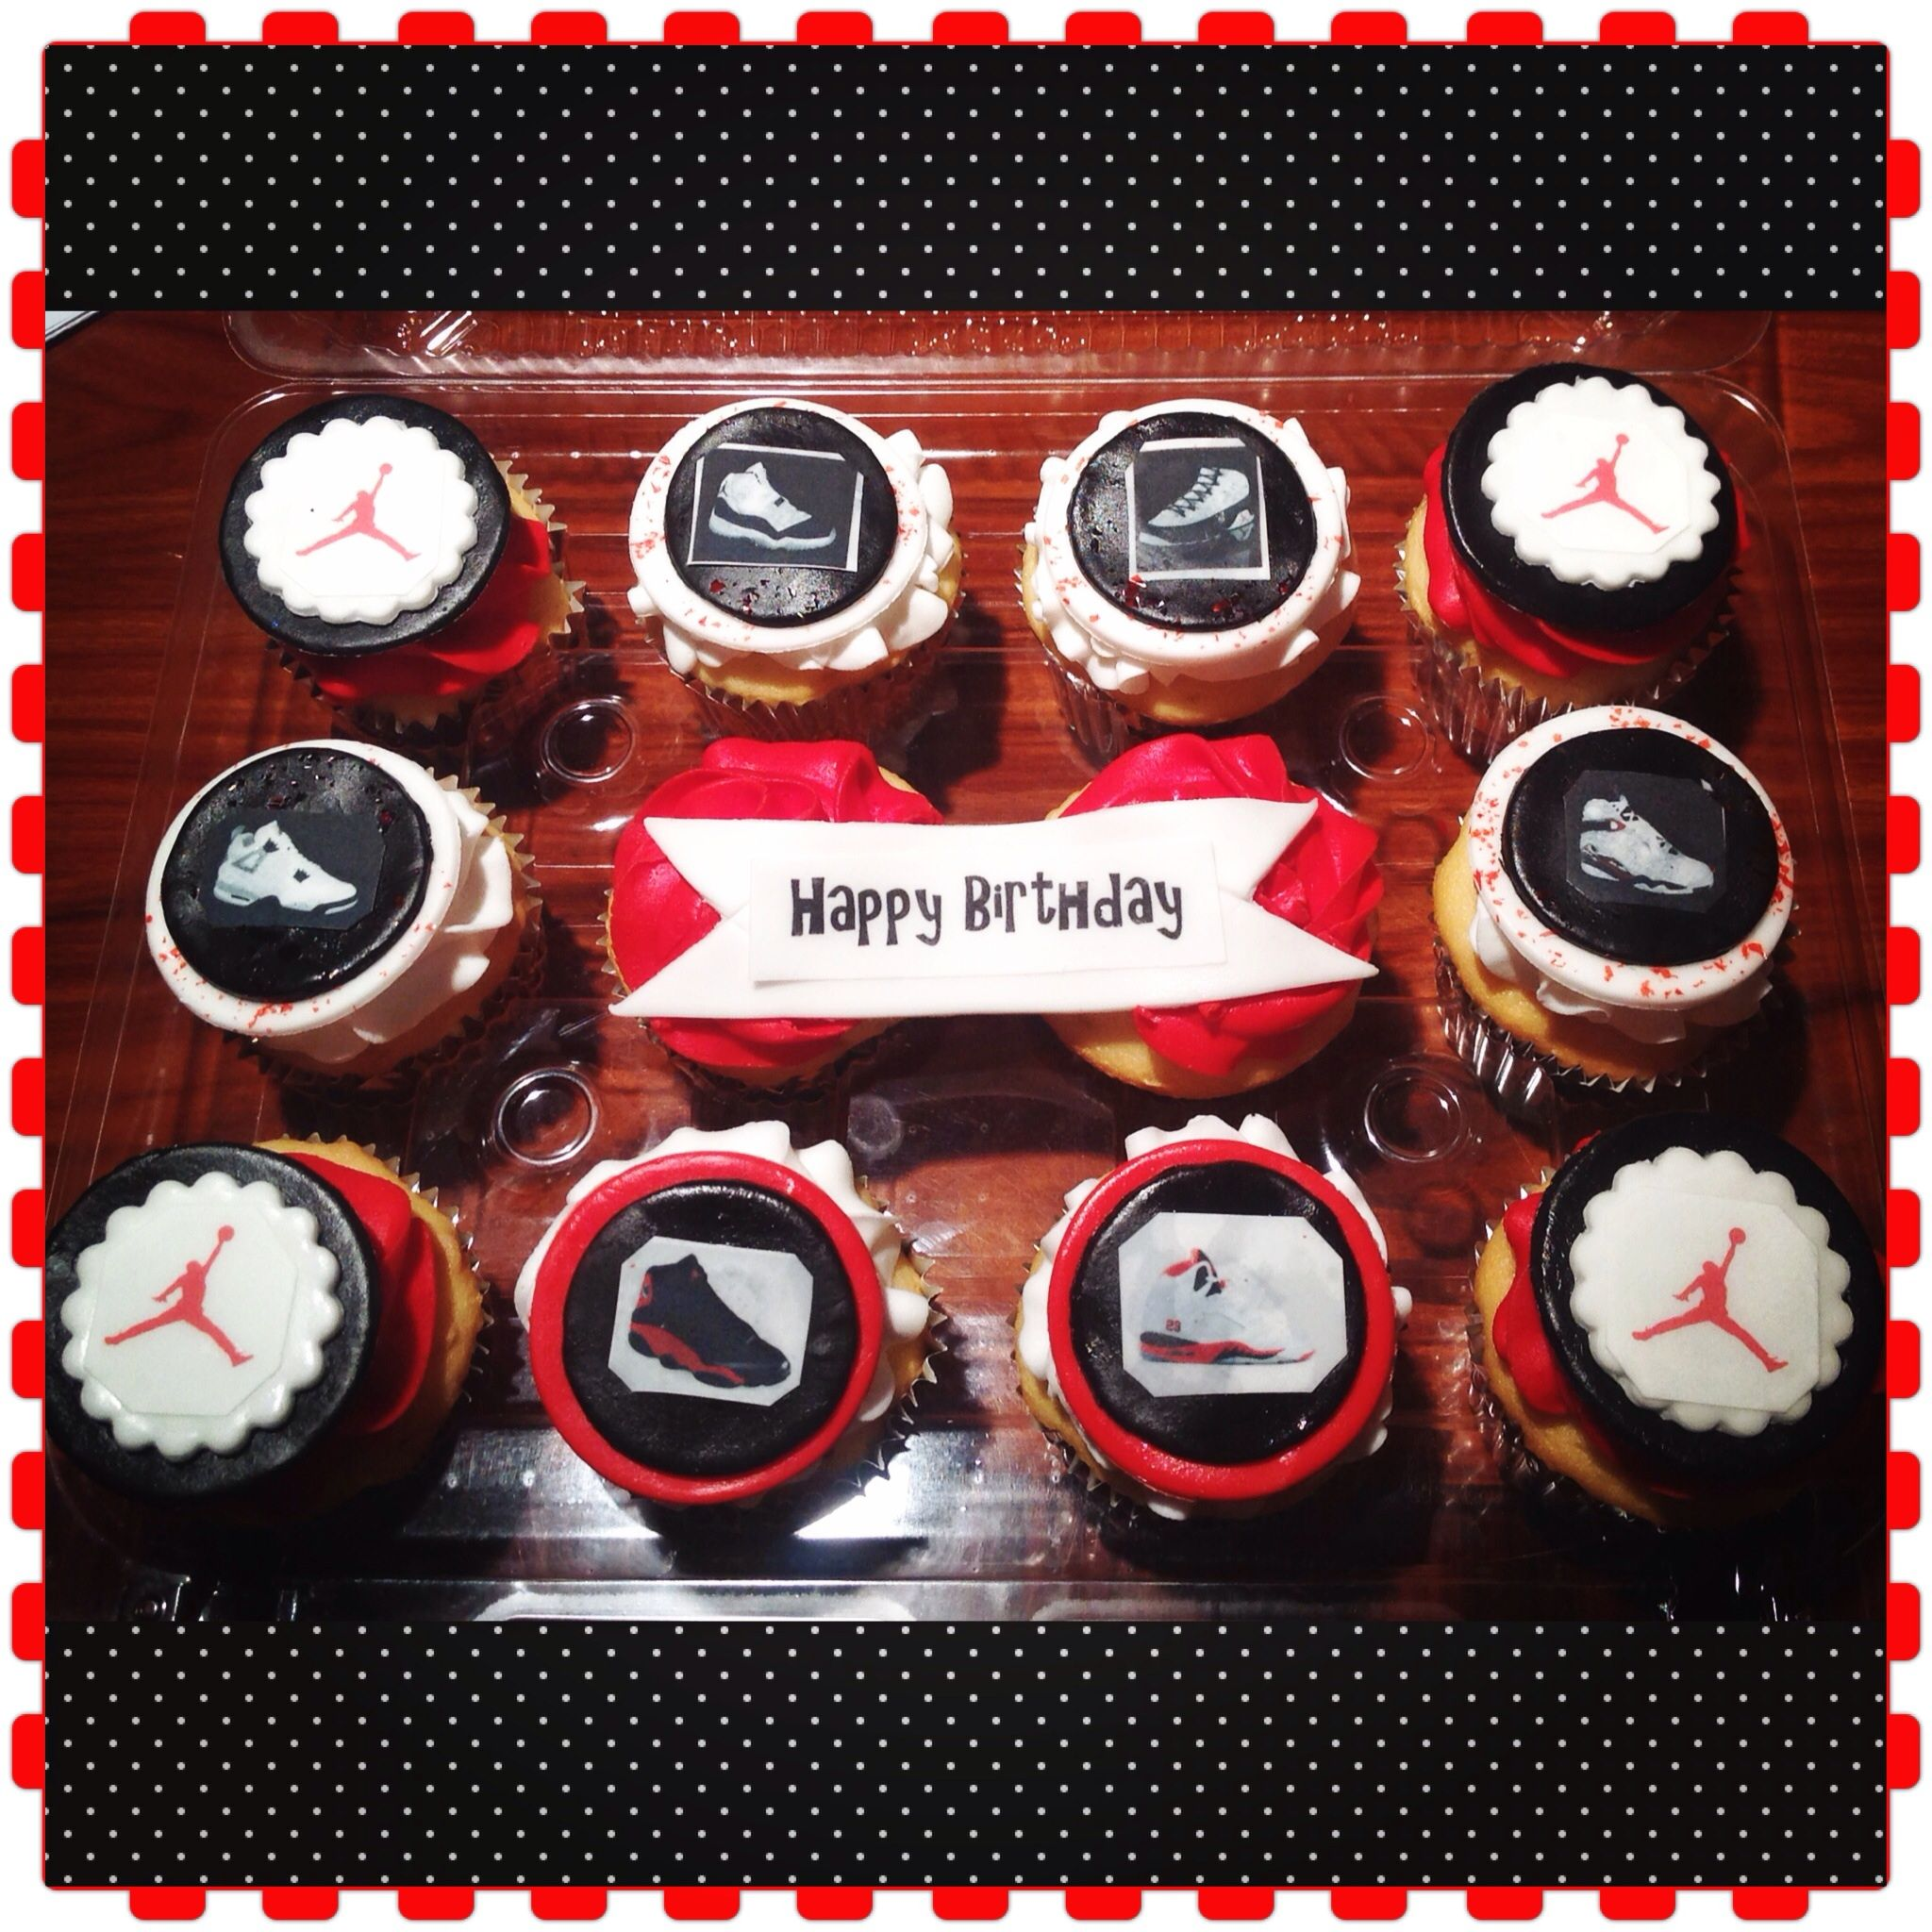 jordan cupcakes